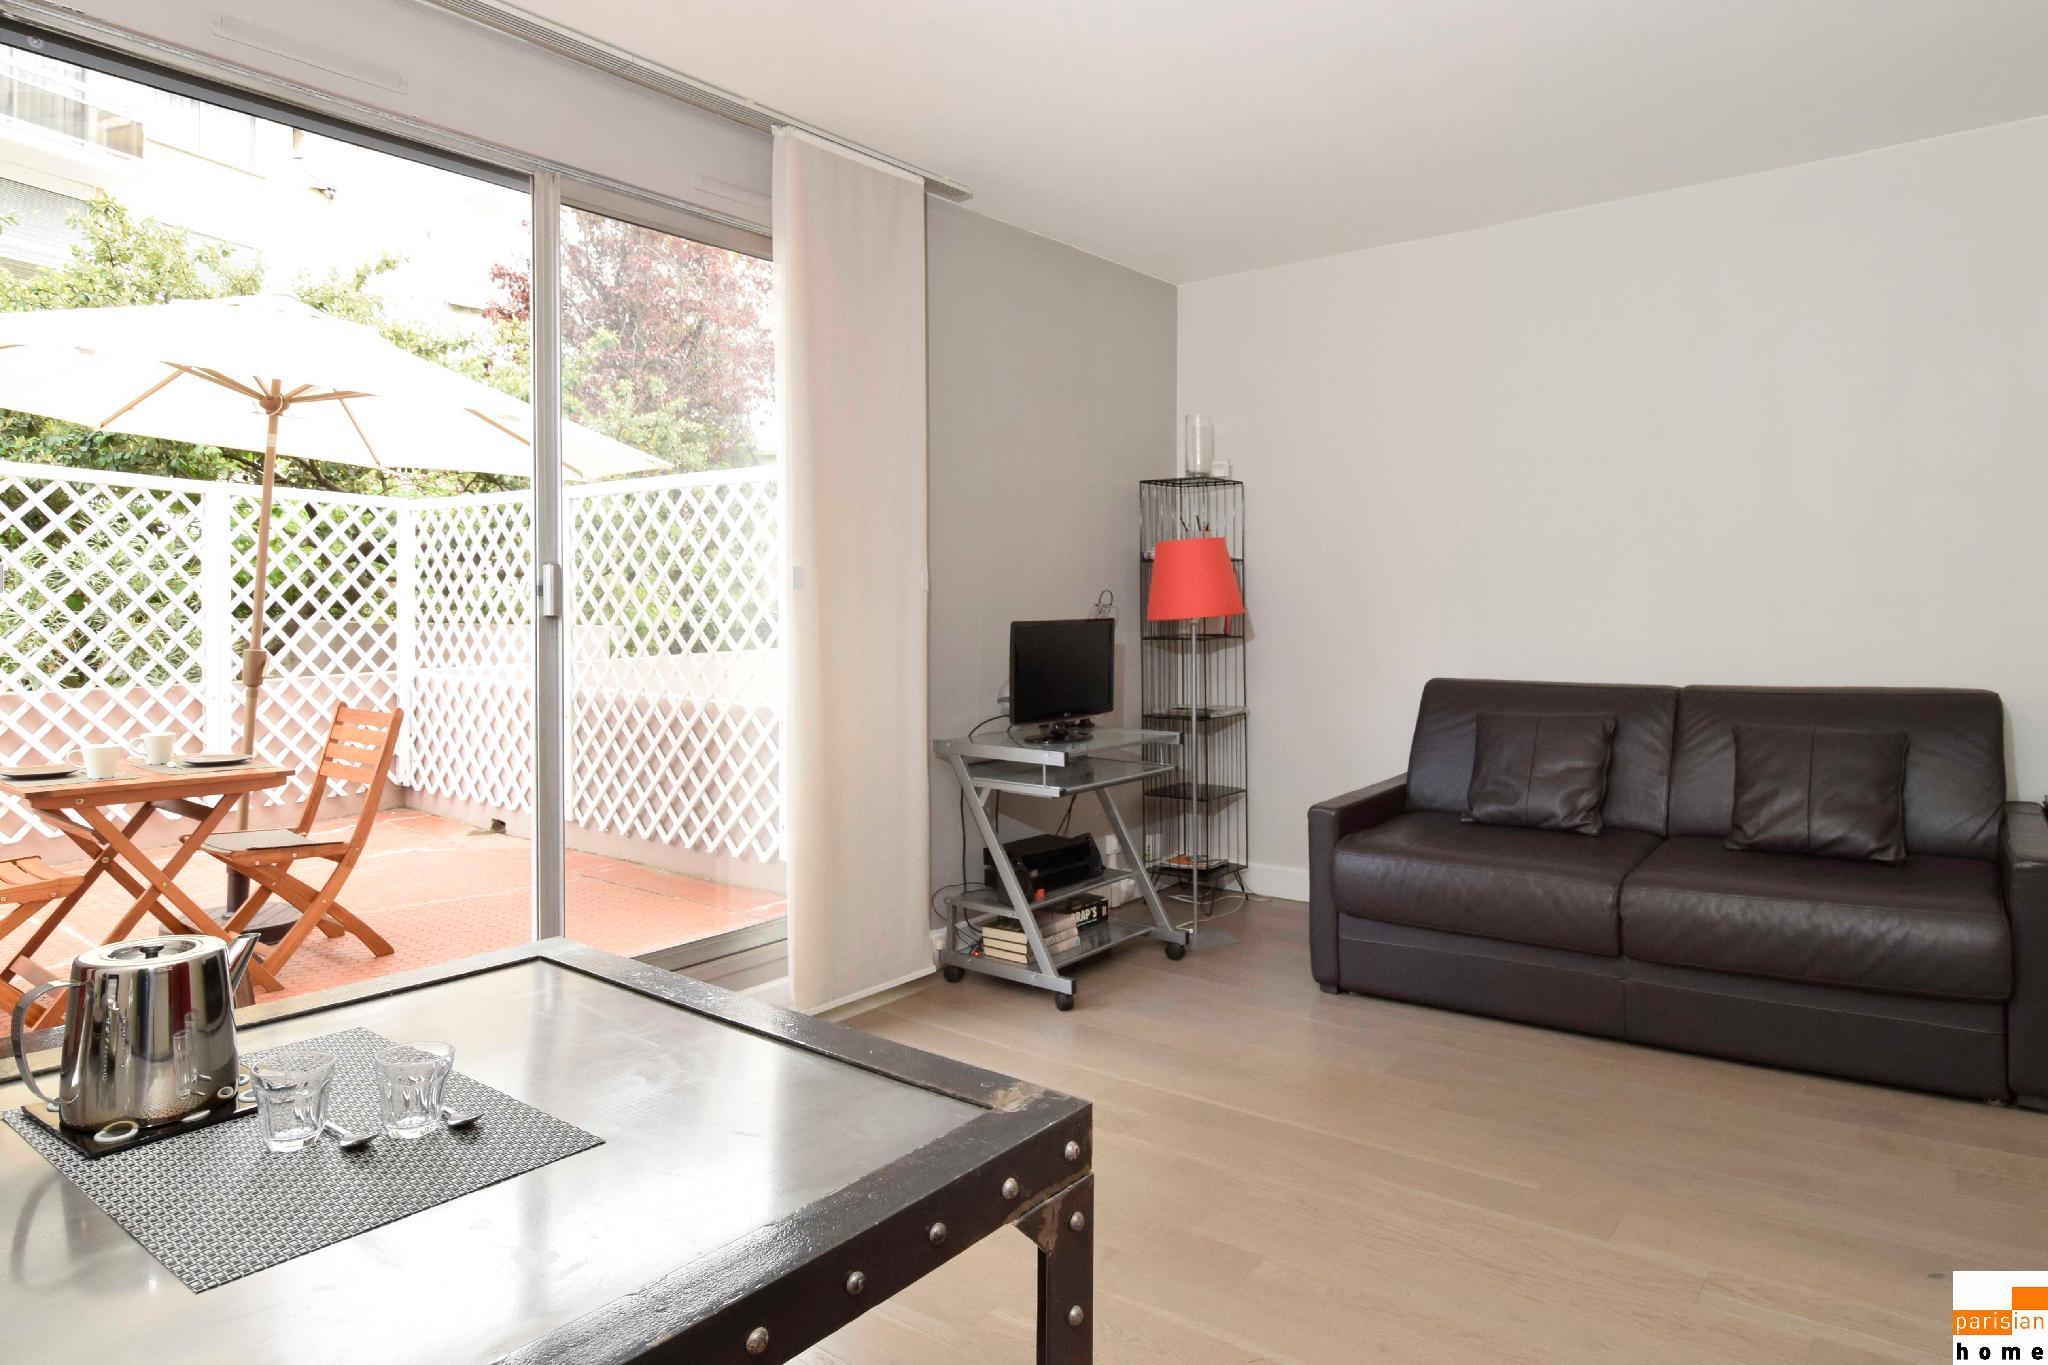 S15177 - Warm studio for 2 people in the Montparnasse area